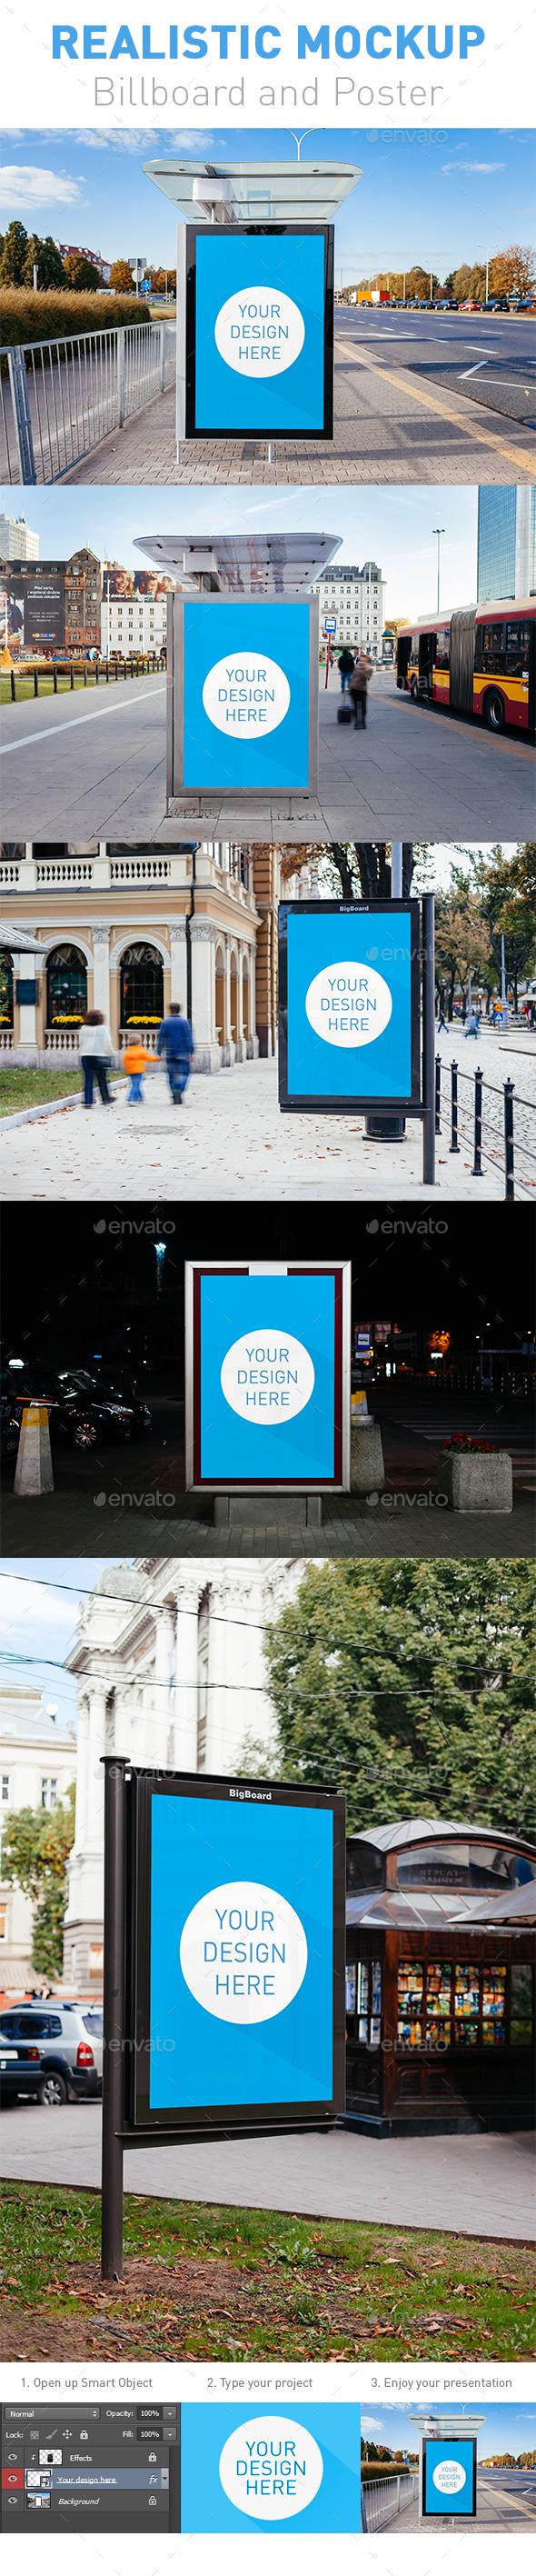 5 Realistic Billboard and Poster Mockup - Product Mock-Ups Graphics